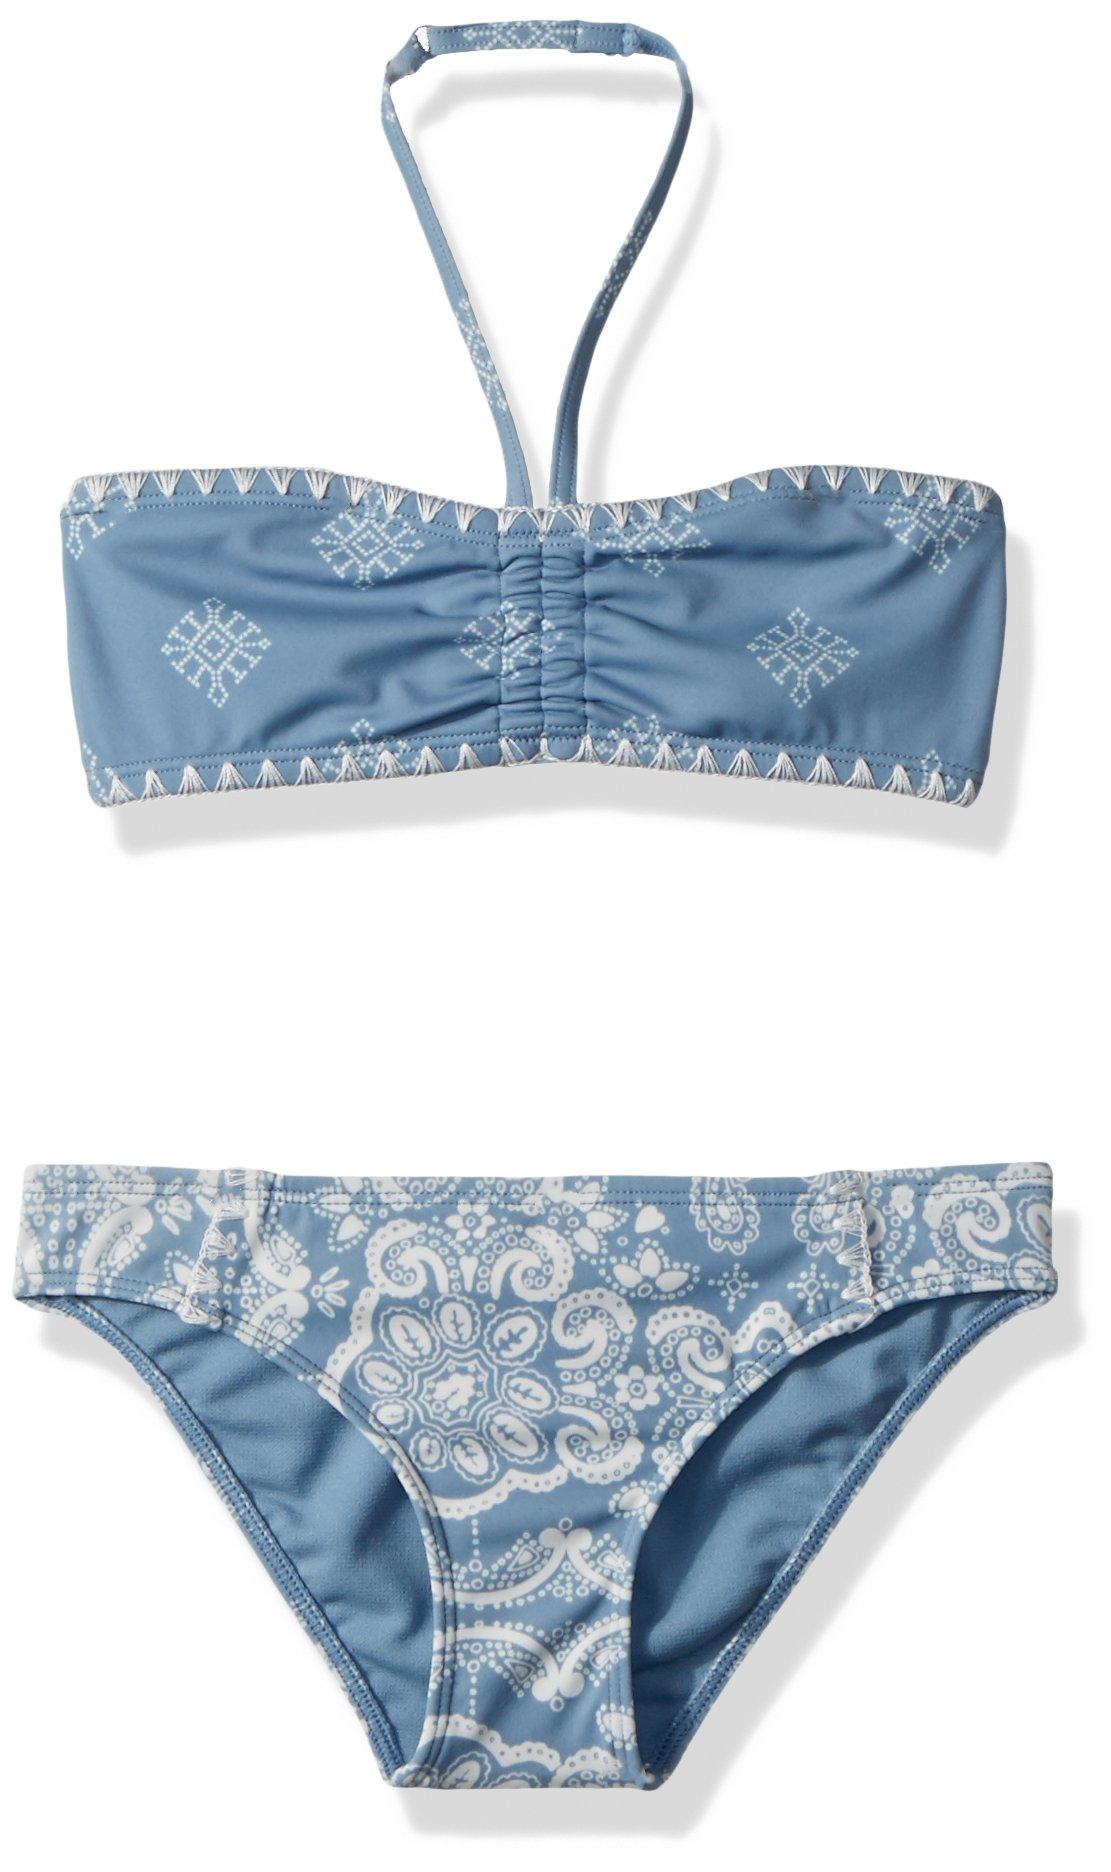 Roxy Big Girls' Nautical Summer Bandeau Swimsuit Set, Blue Shadow Bandana Kids, 7